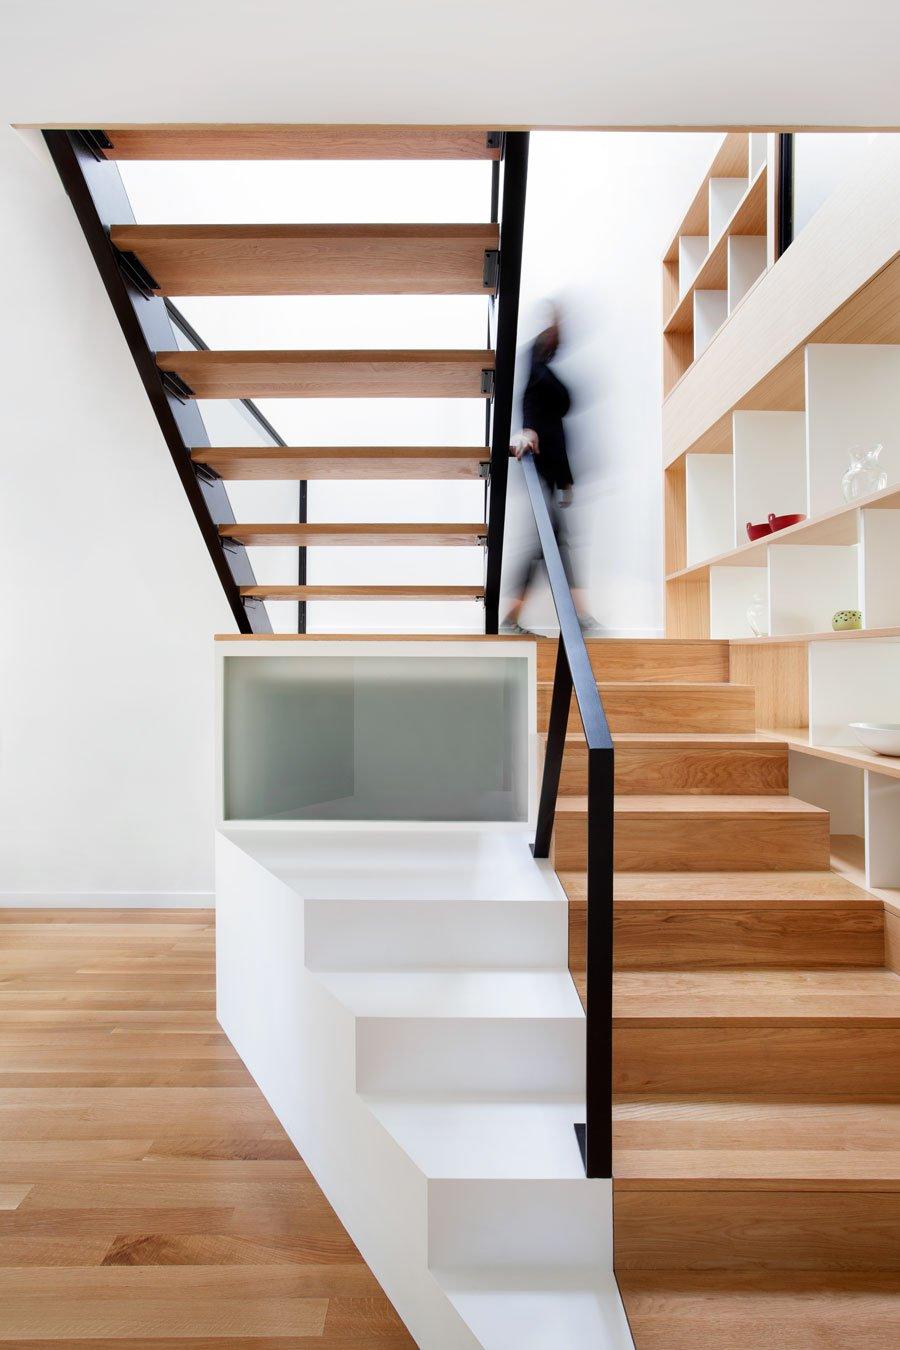 Chambord residence by naturehumaine escalier for Escalier maison contemporaine